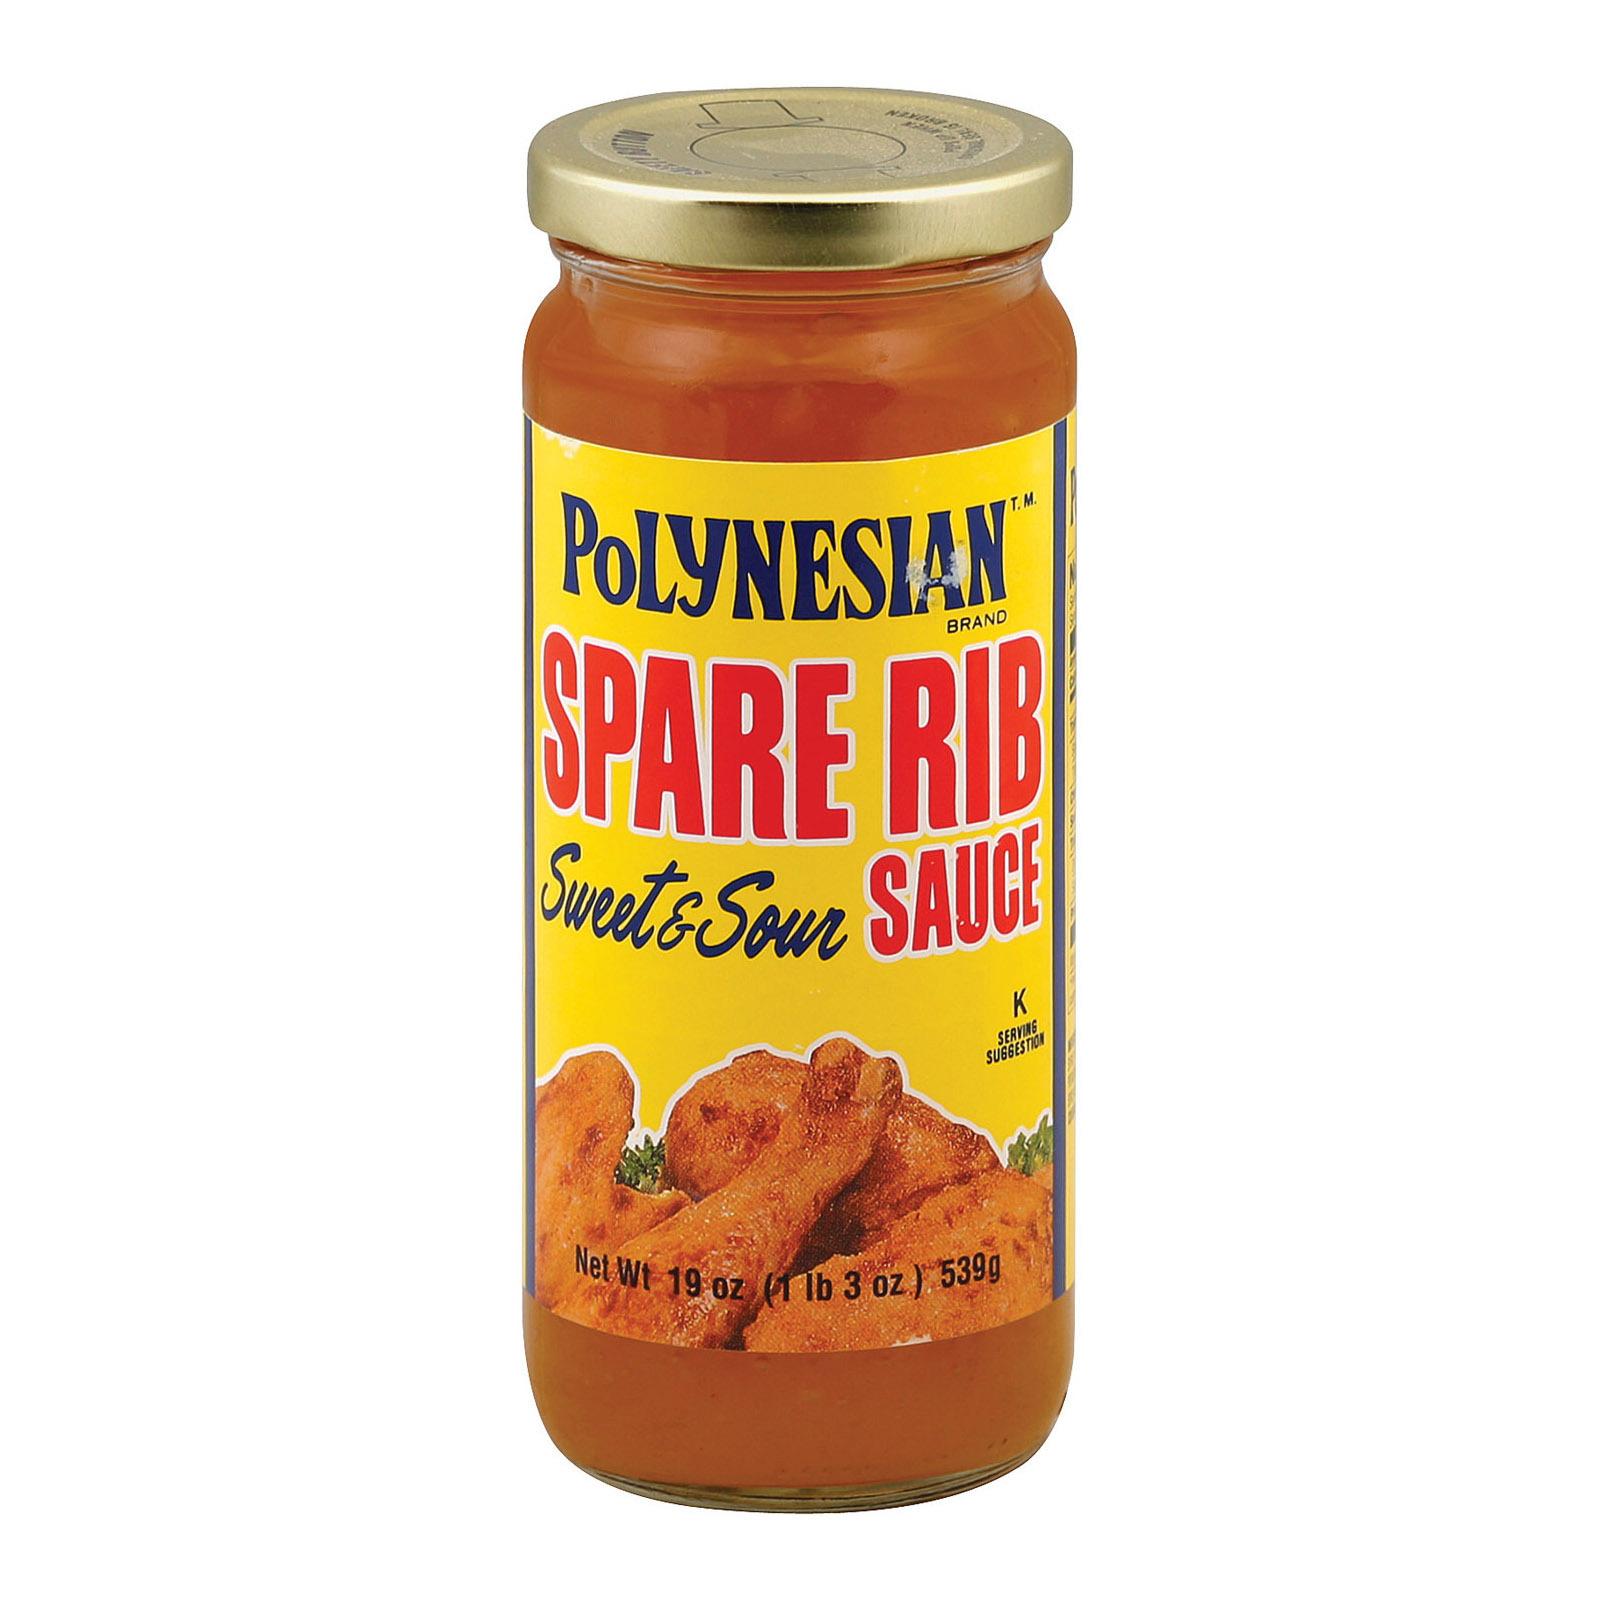 Polynesian Sparerib Sauce - 19 oz.